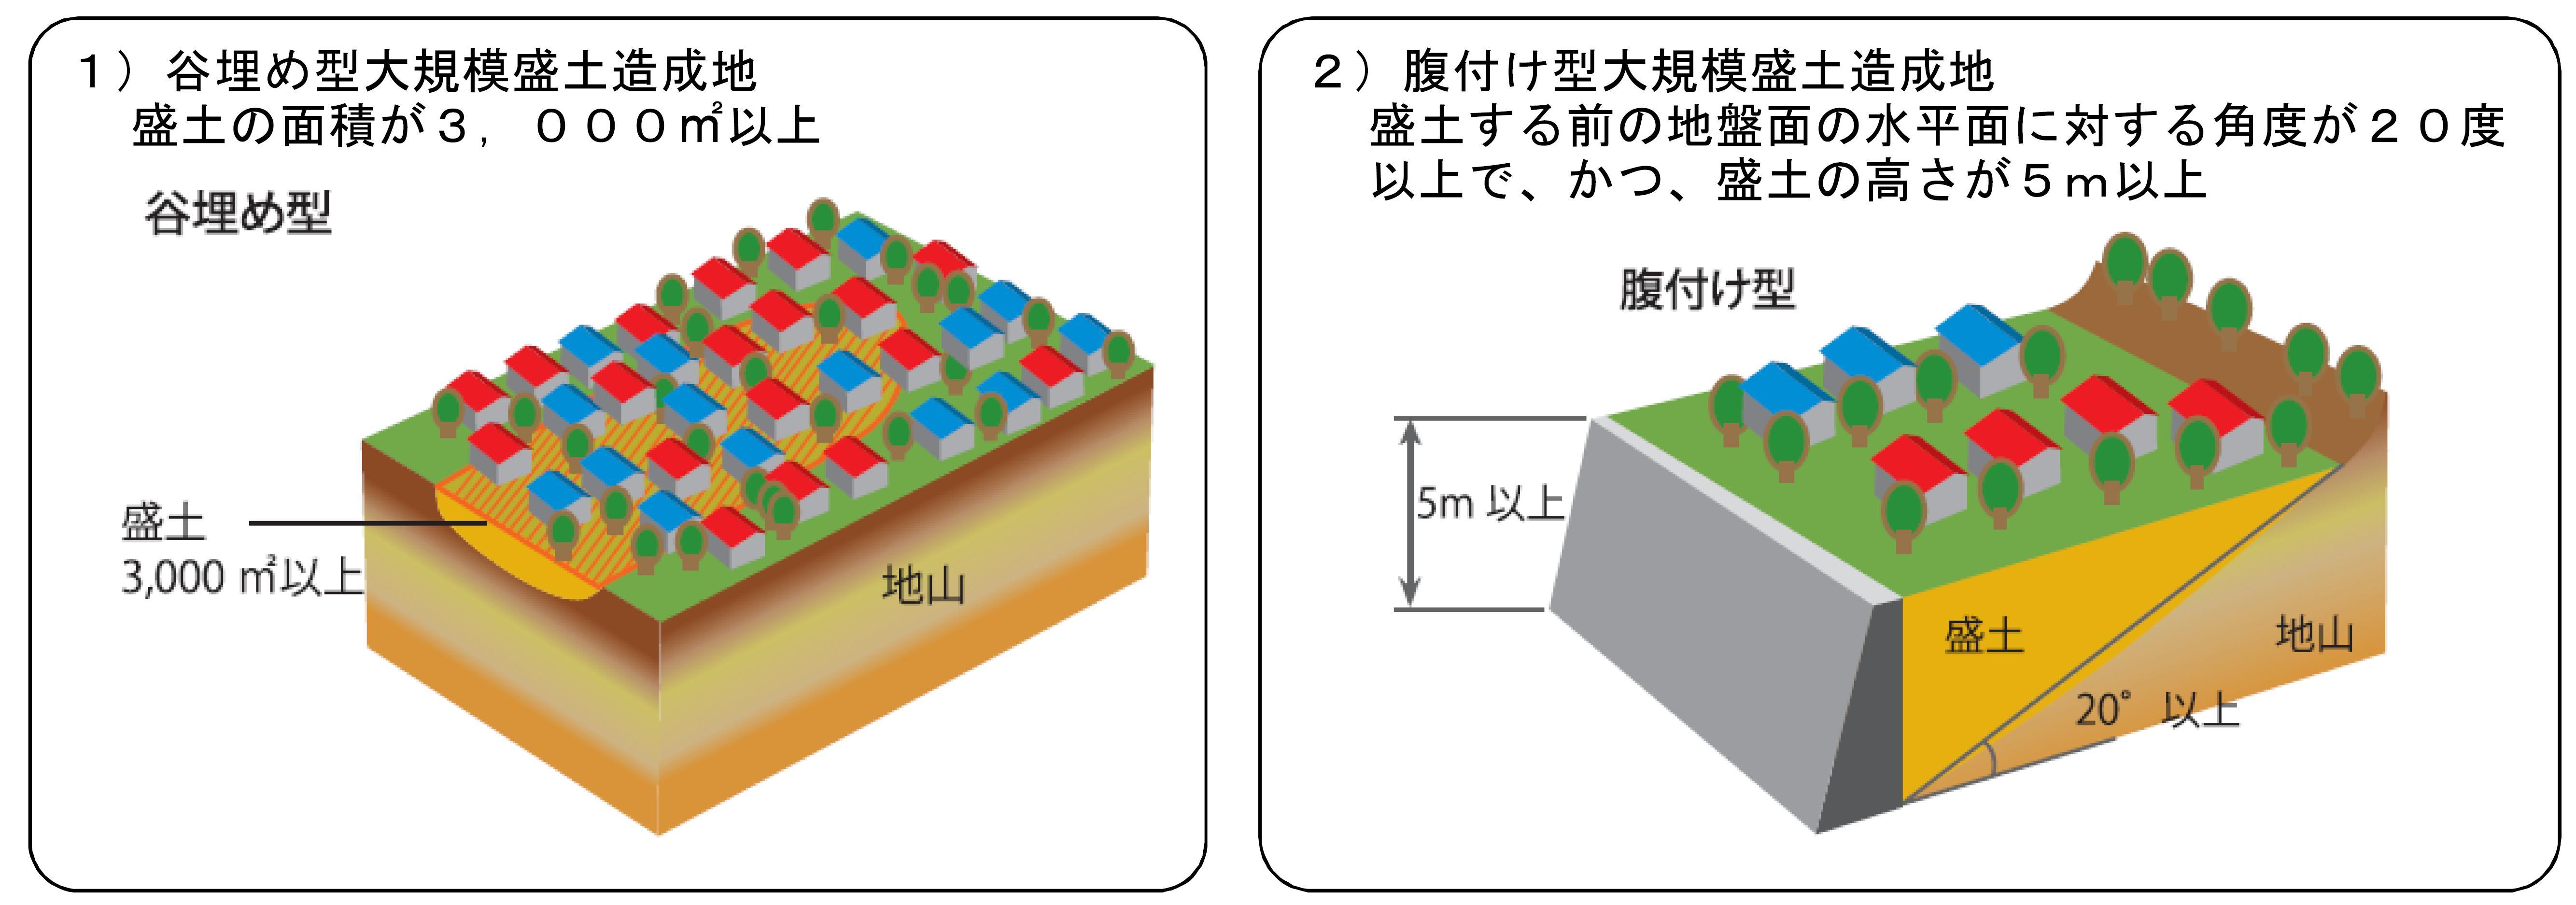 大阪府/大規模盛土造成地マップ